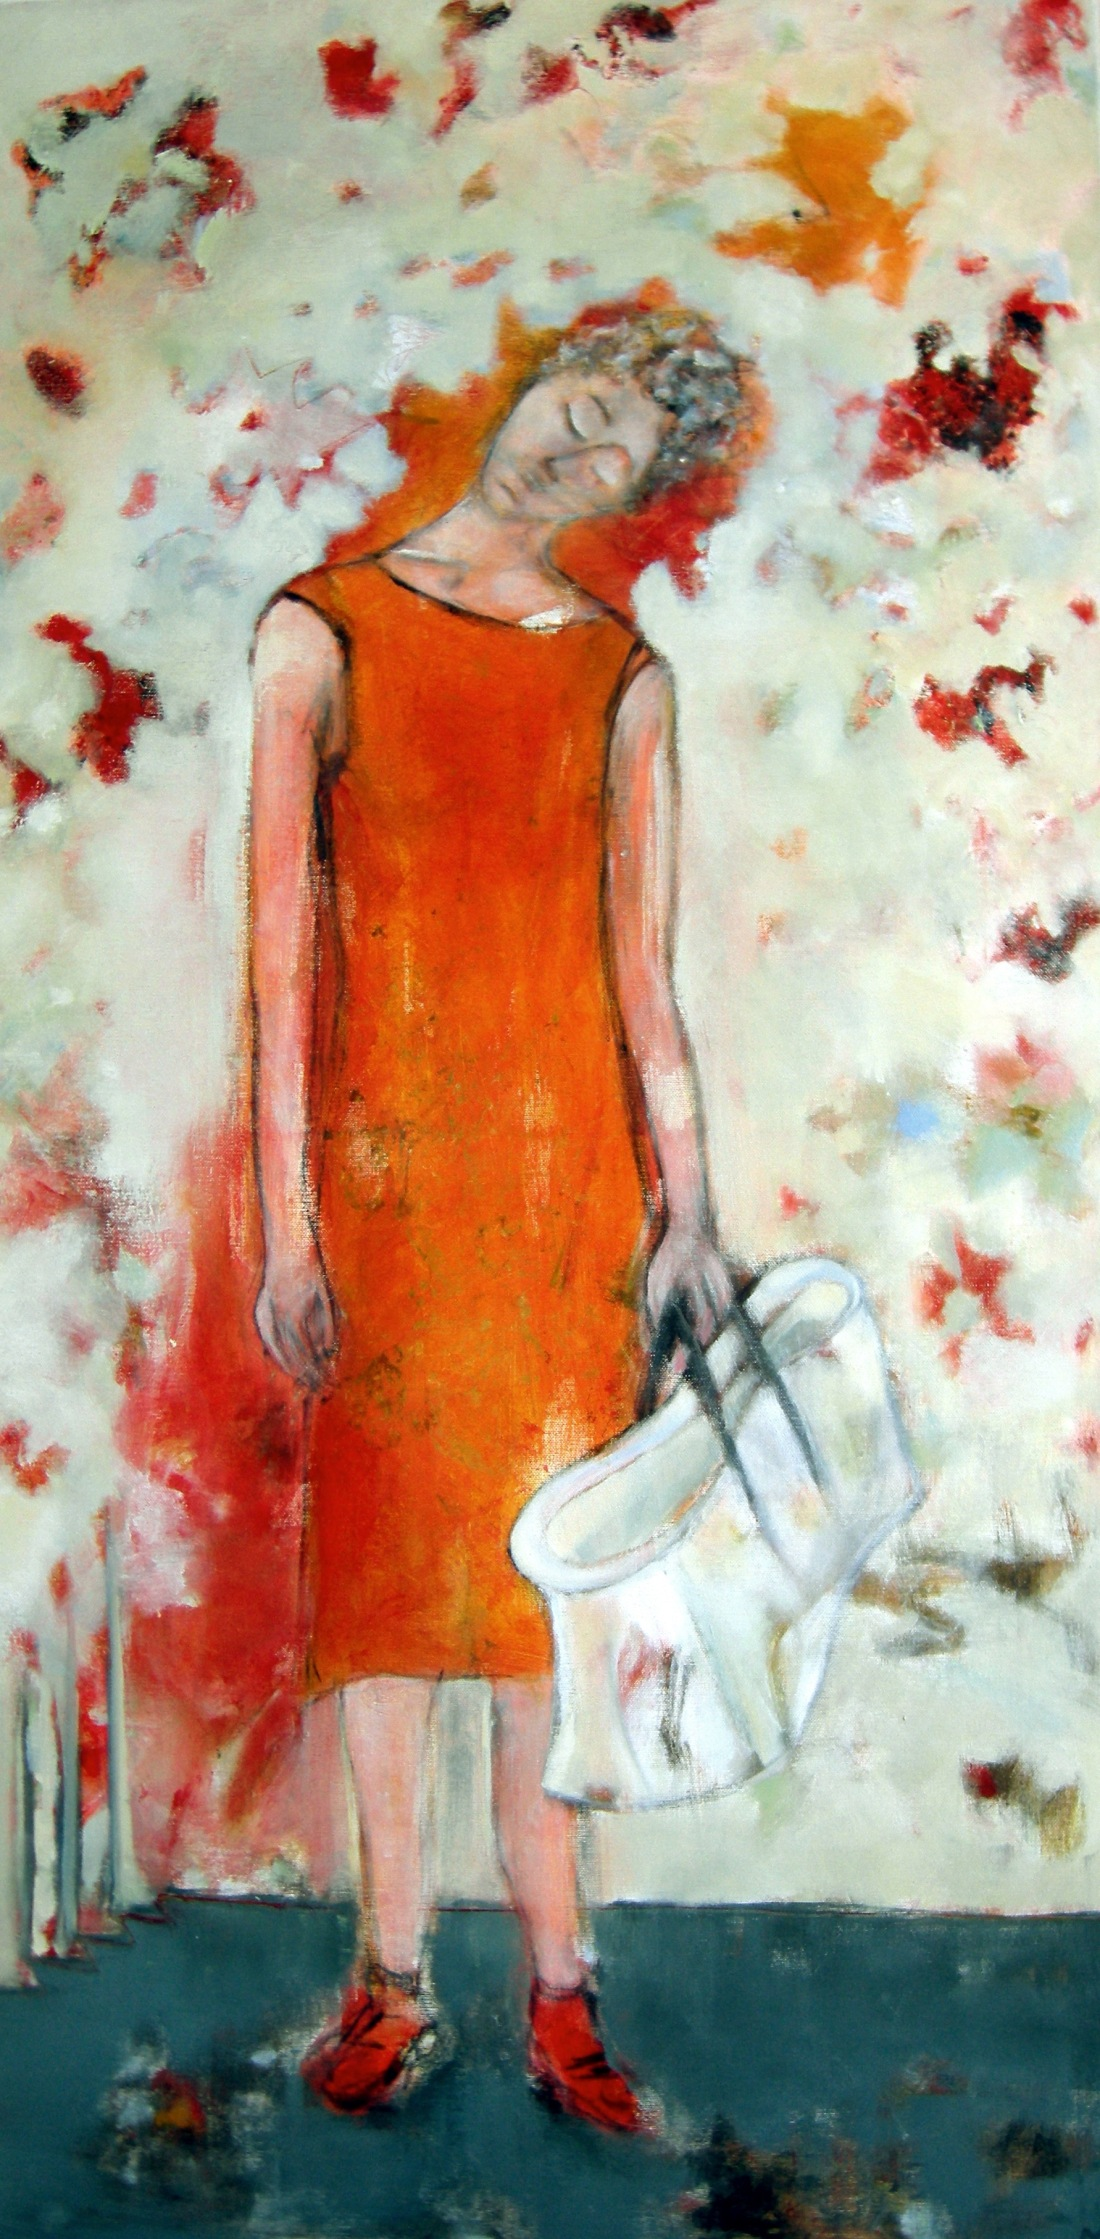 Doornroosje, 2008, olie op doek, 60x120 kopie